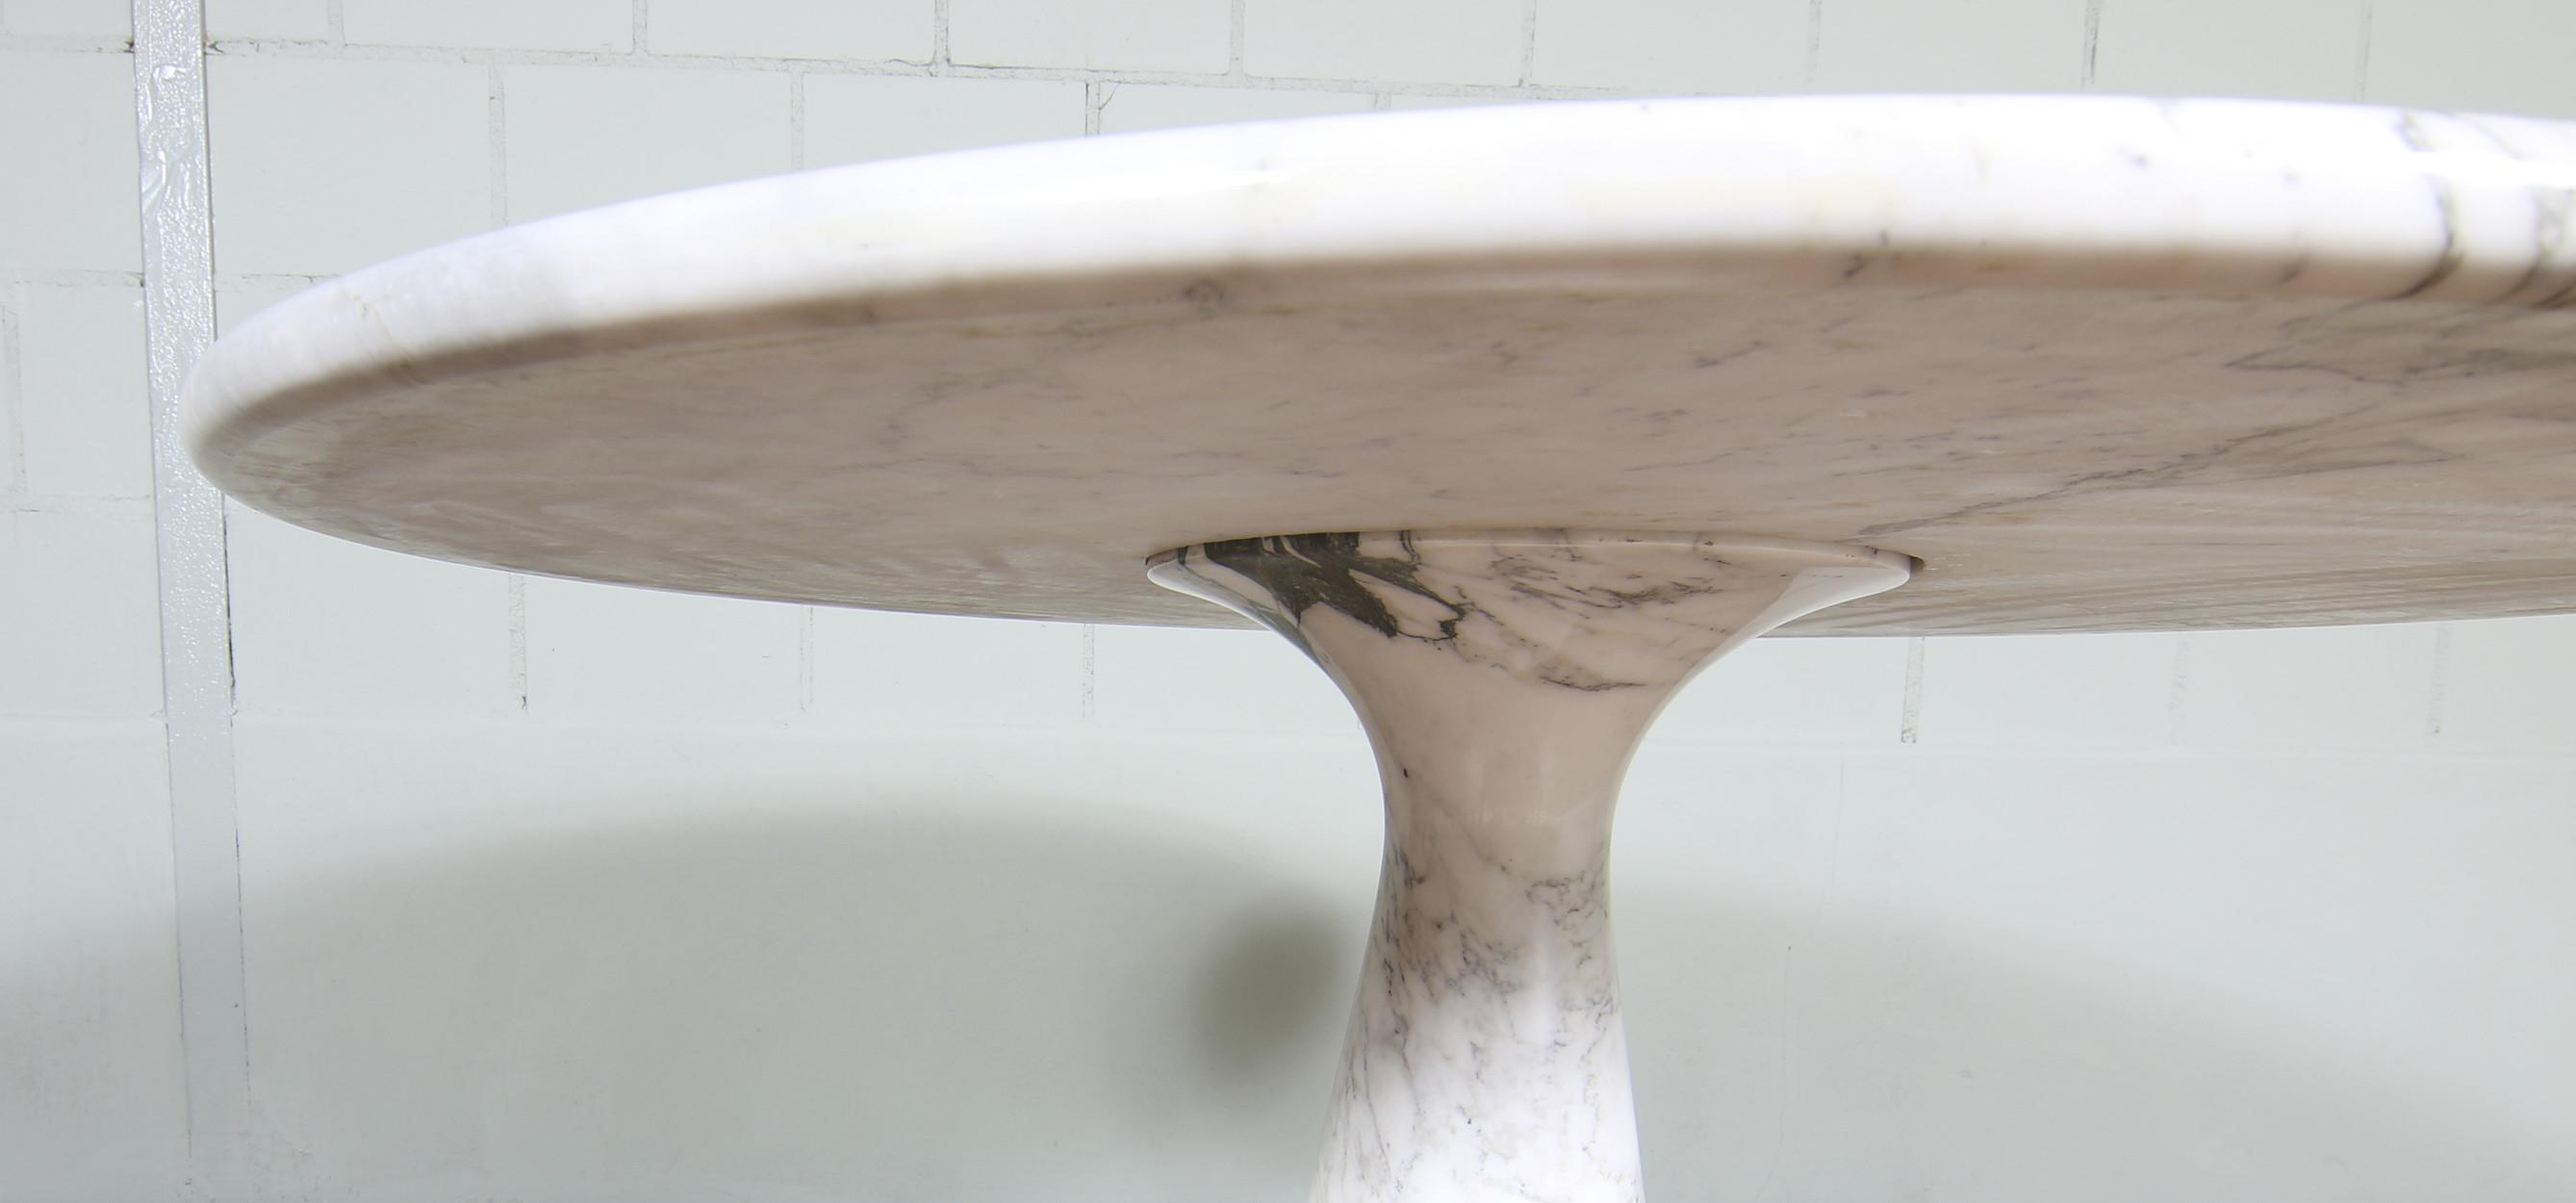 Angelo Mangiorotti Marble Dining Table Carrara Mariekke Vintage Design Furniture 4 Gd Duran